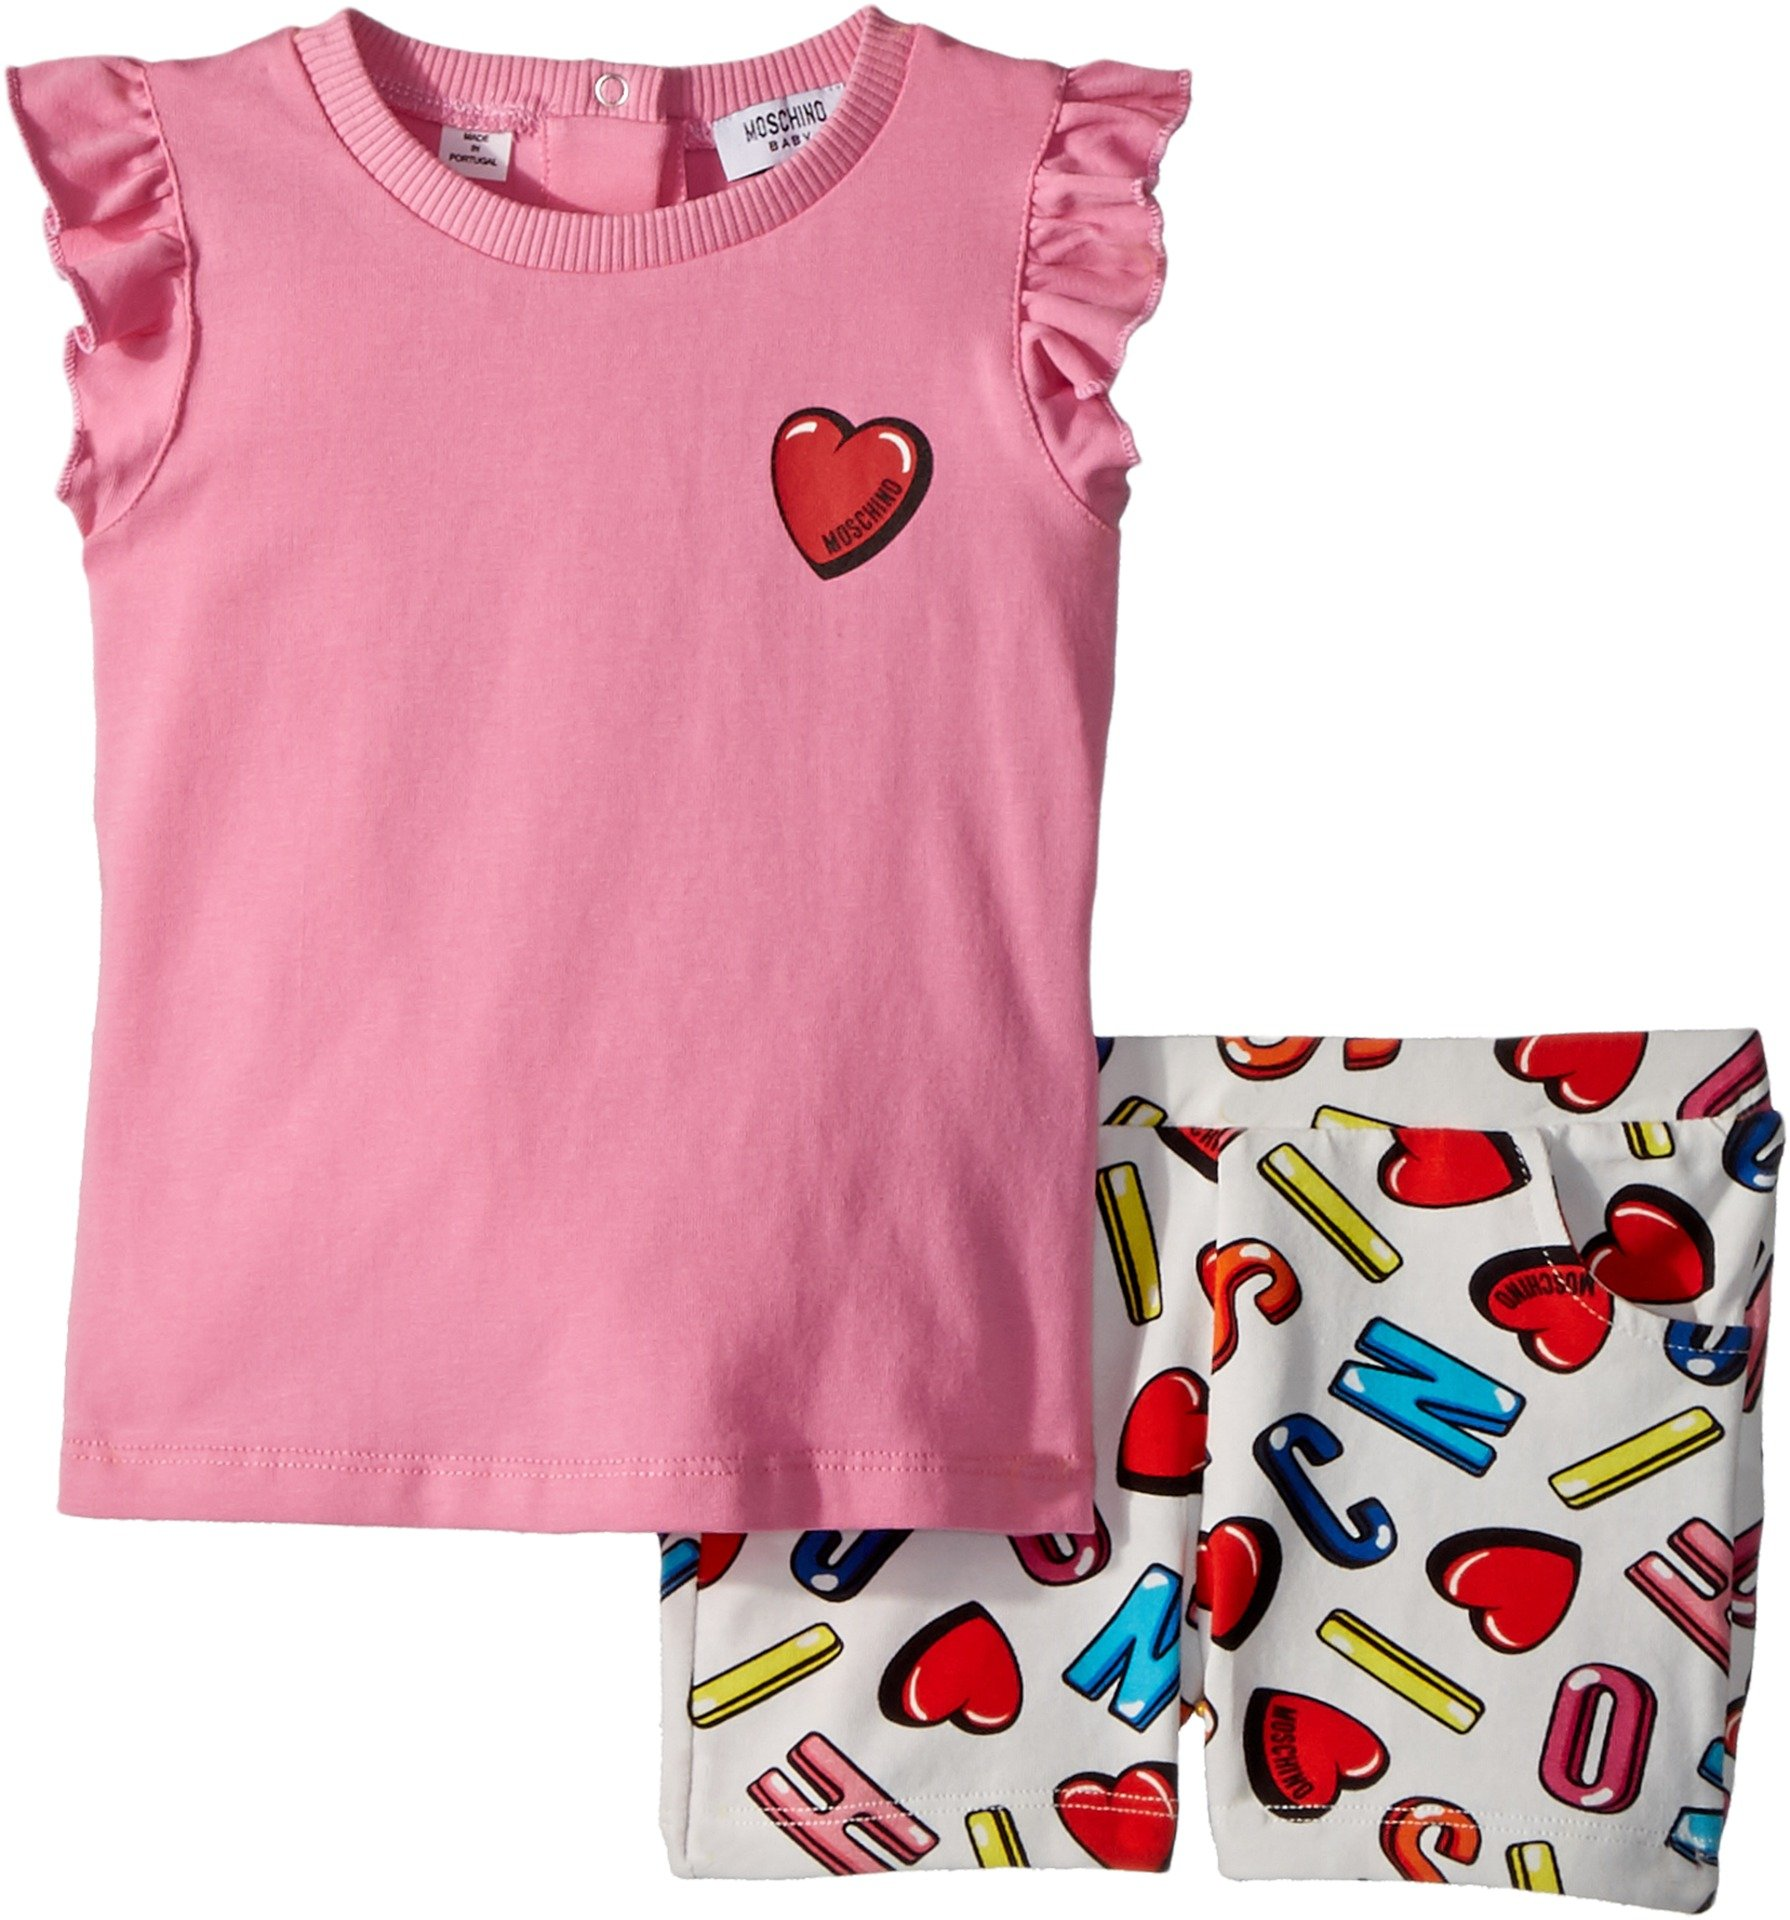 Moschino Kids Baby Girl's Logo Heart Graphic T-Shirt & Shorts Set (Infant/Toddler) Multi 12-18